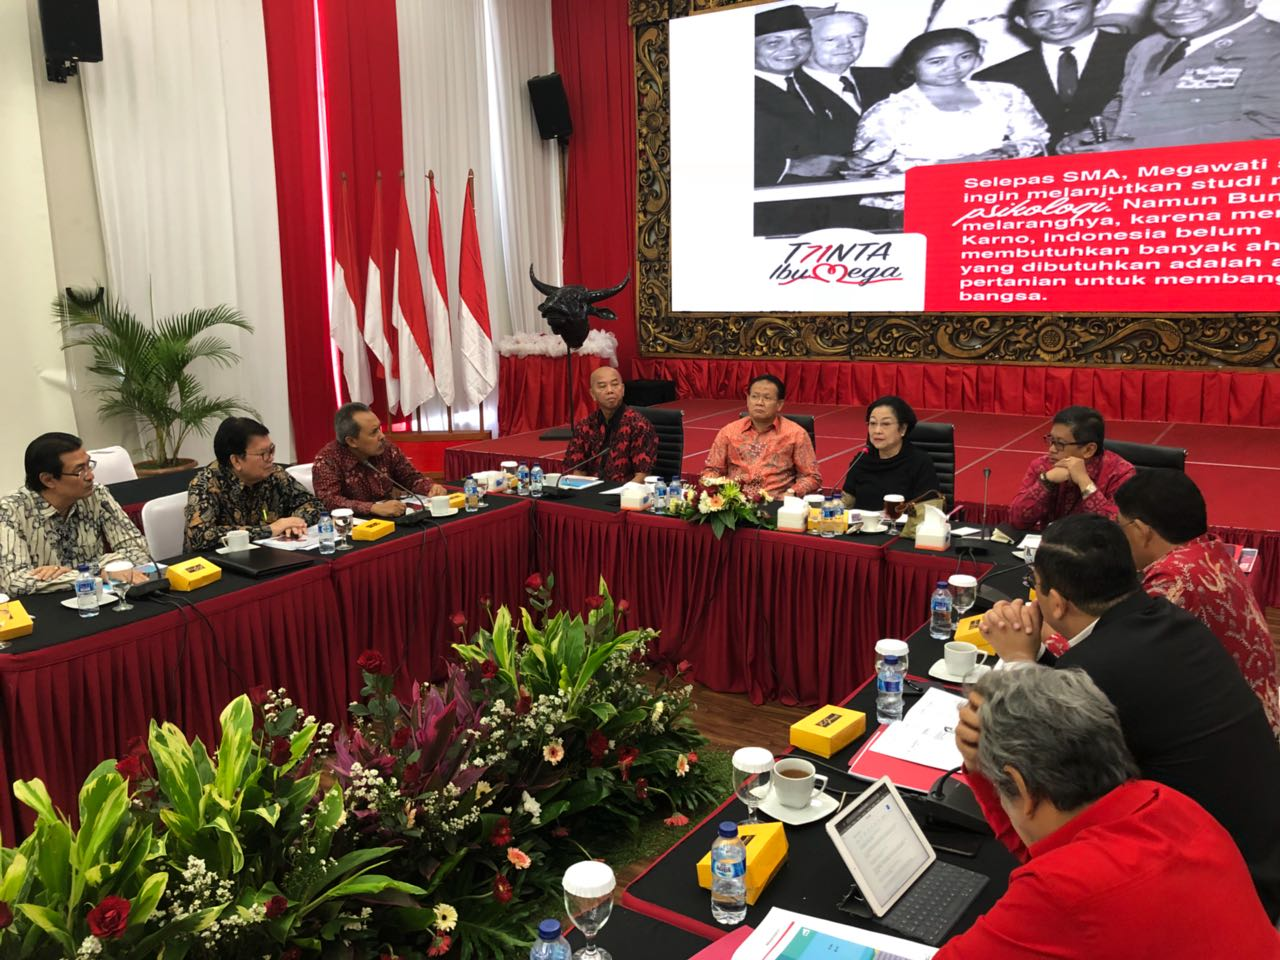 https: img.okezone.com content 2018 03 15 337 1873325 megawati-indonesia-sudah-sepantasnya-miliki-badan-riset-nasional-wgApCsIskk.jpeg